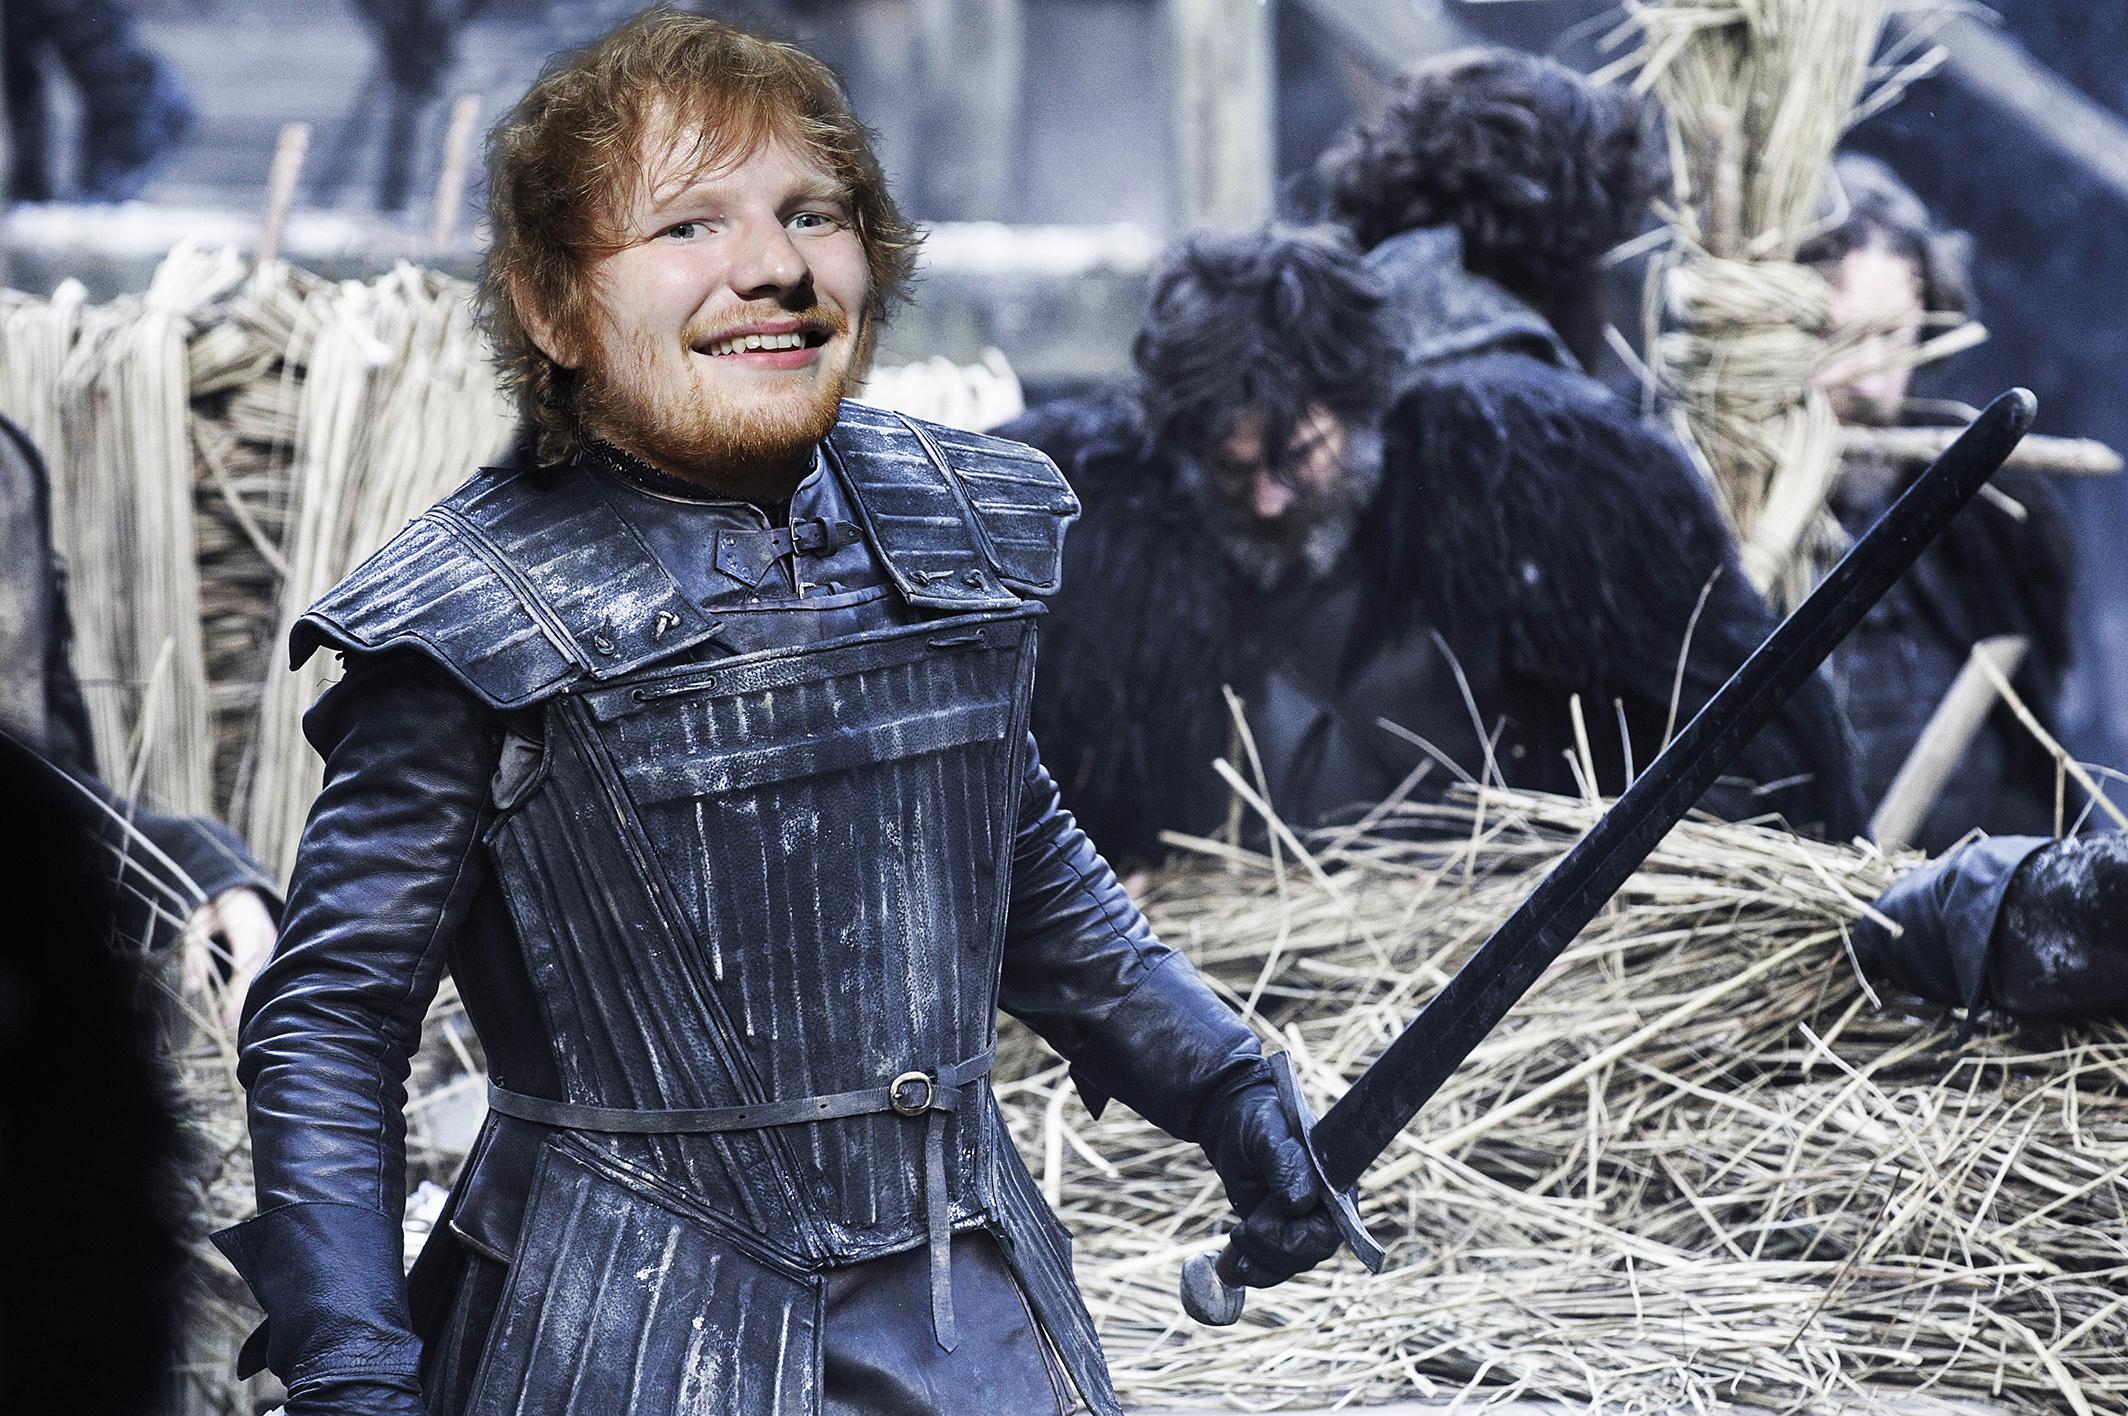 Ed Sheeran for Game Of Thrones season 6? WHAT?!